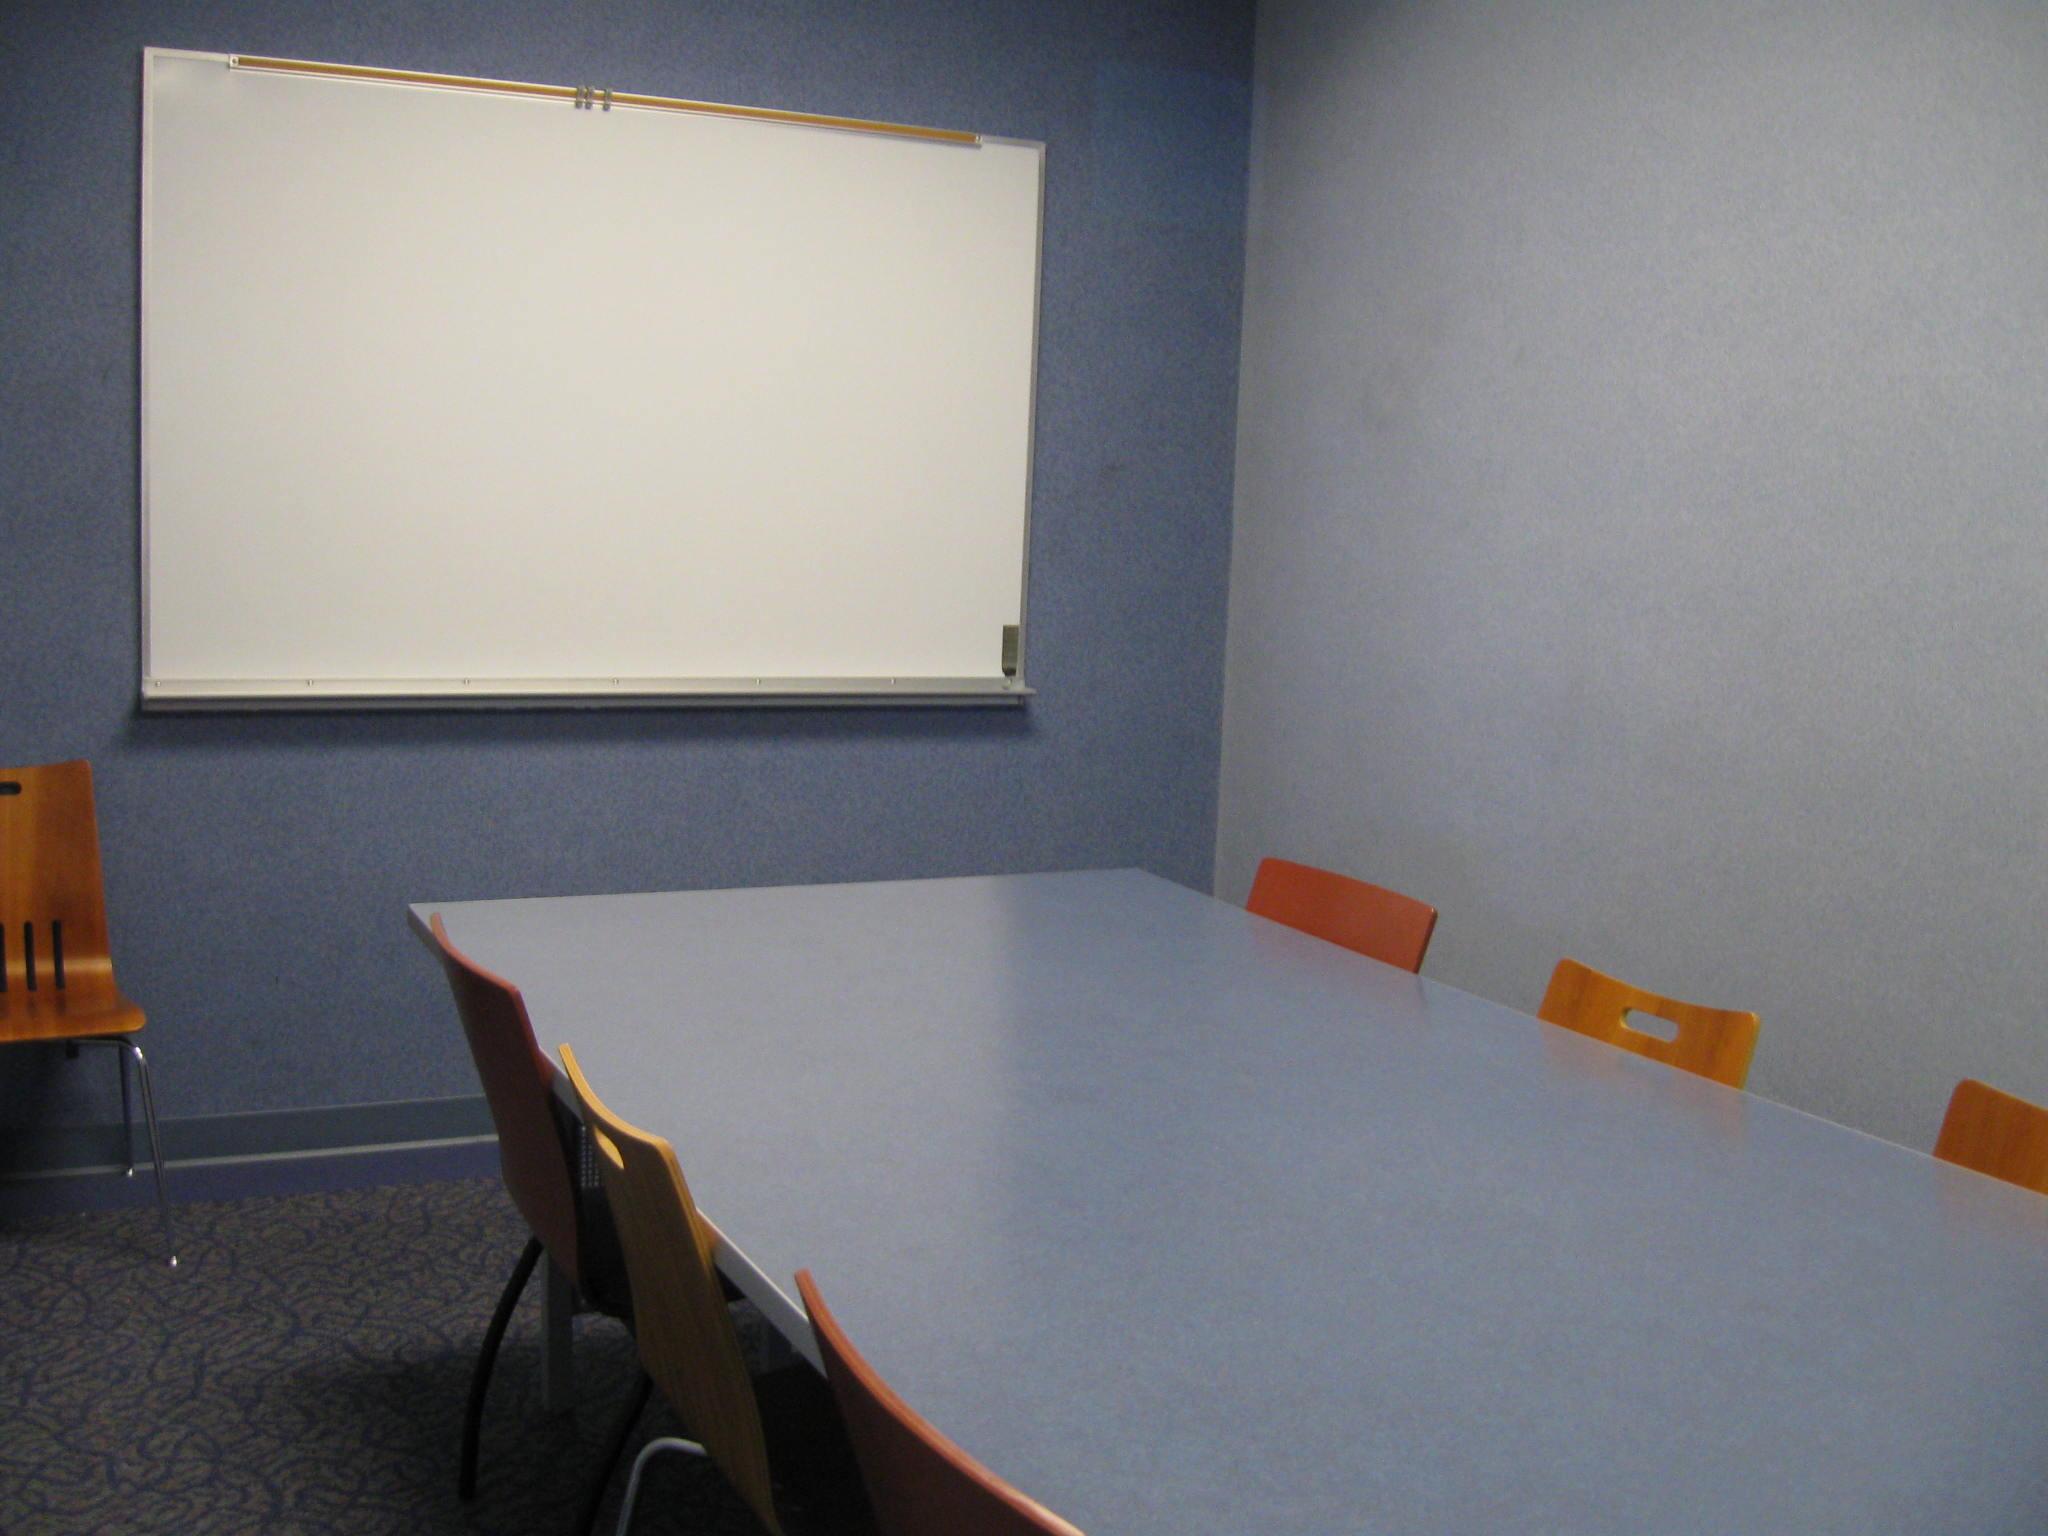 Study Room R204